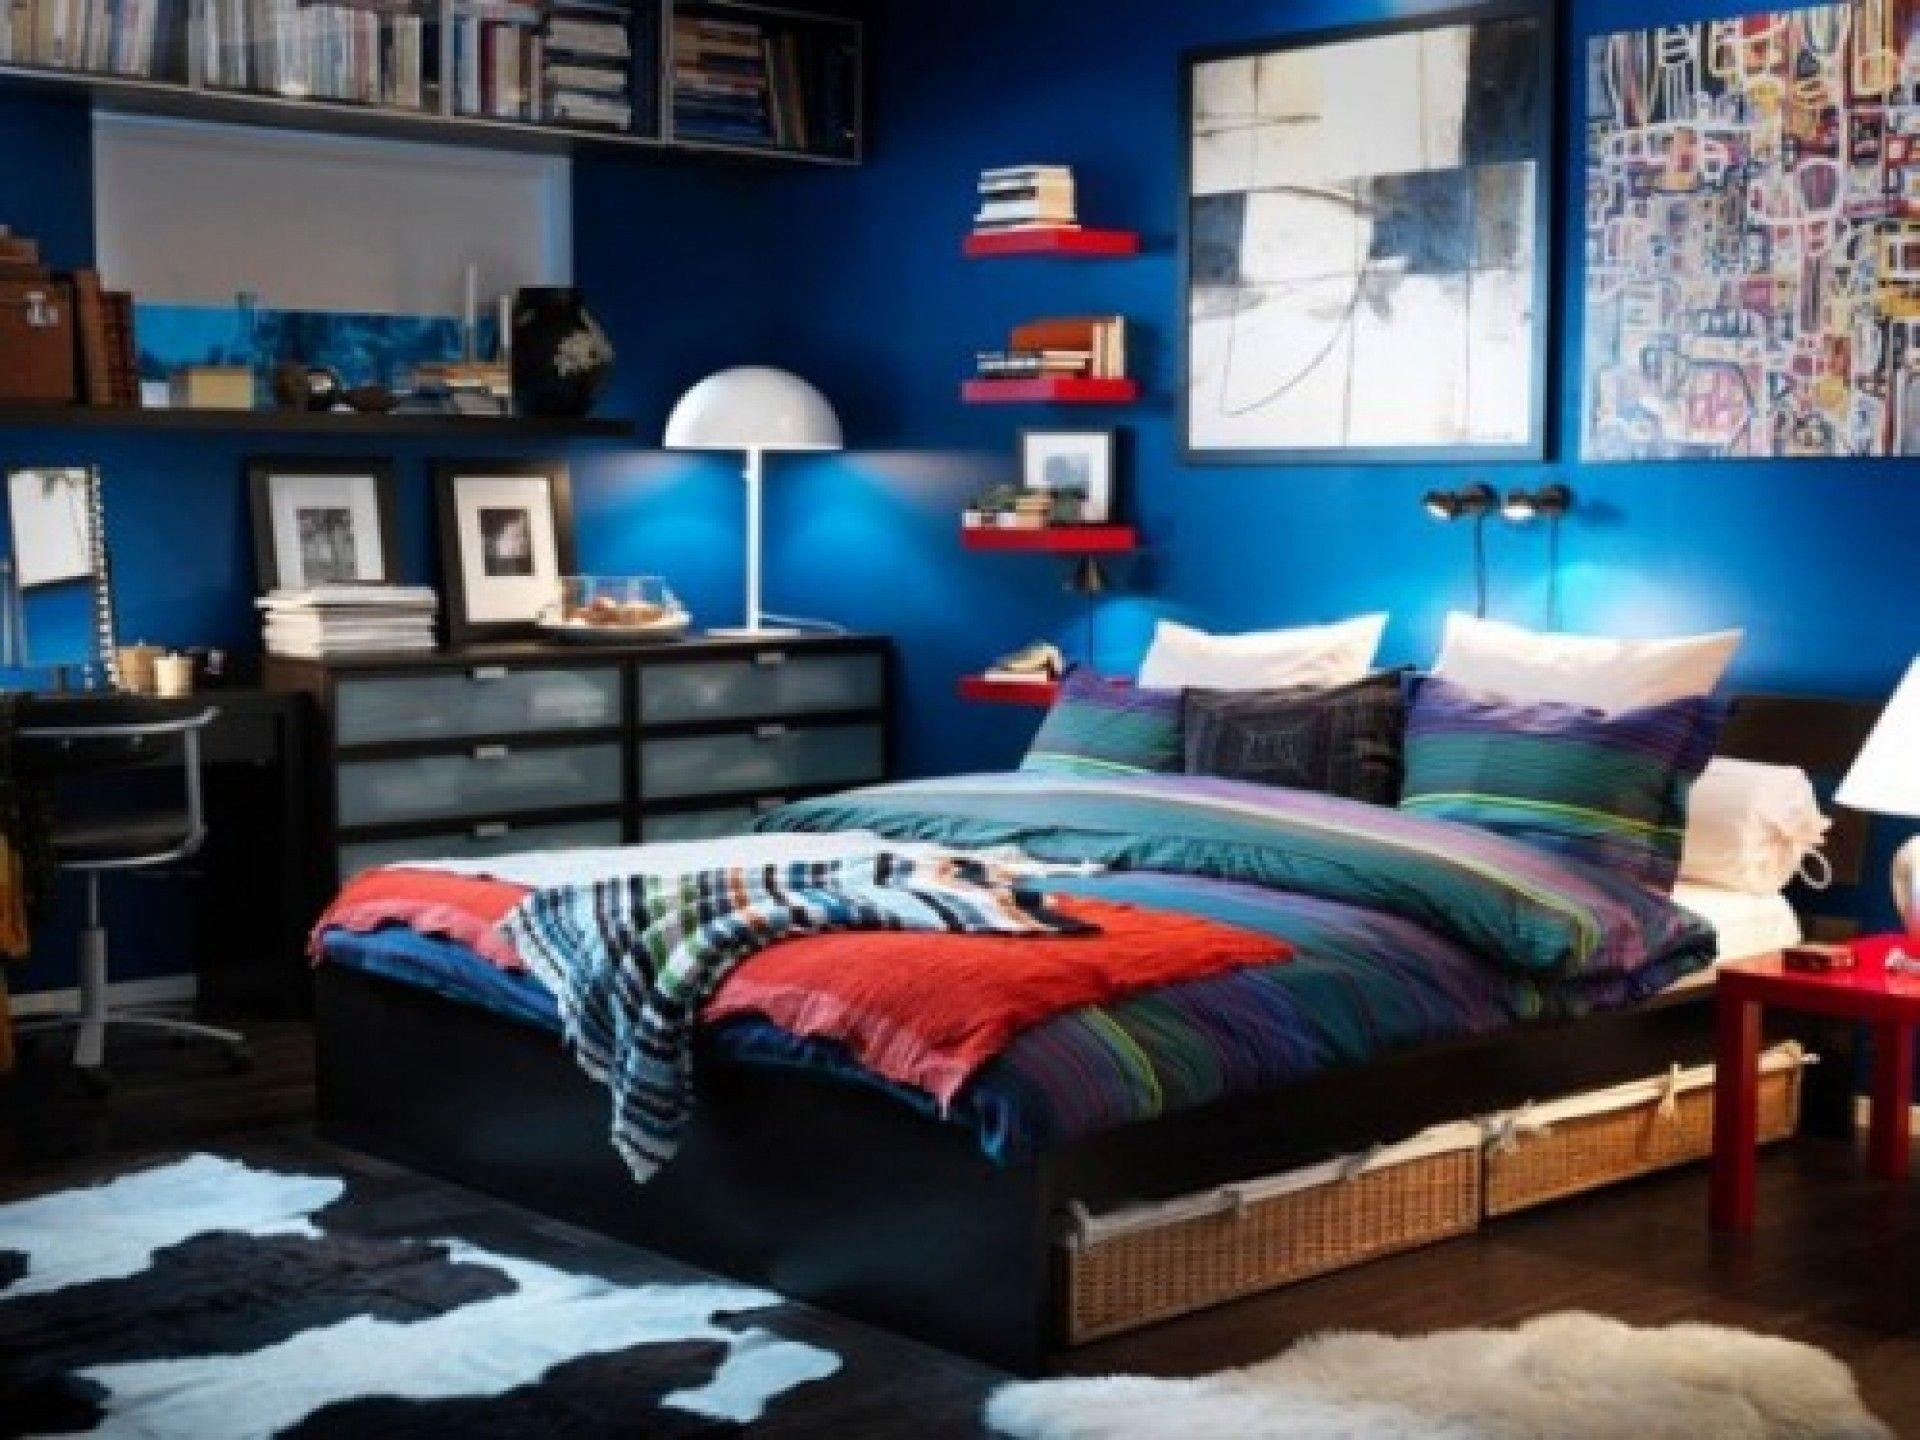 10 Beautiful Cool Room Ideas For Teenage Guys stair storage cool room ideas for college guys sofa bed feat 2020